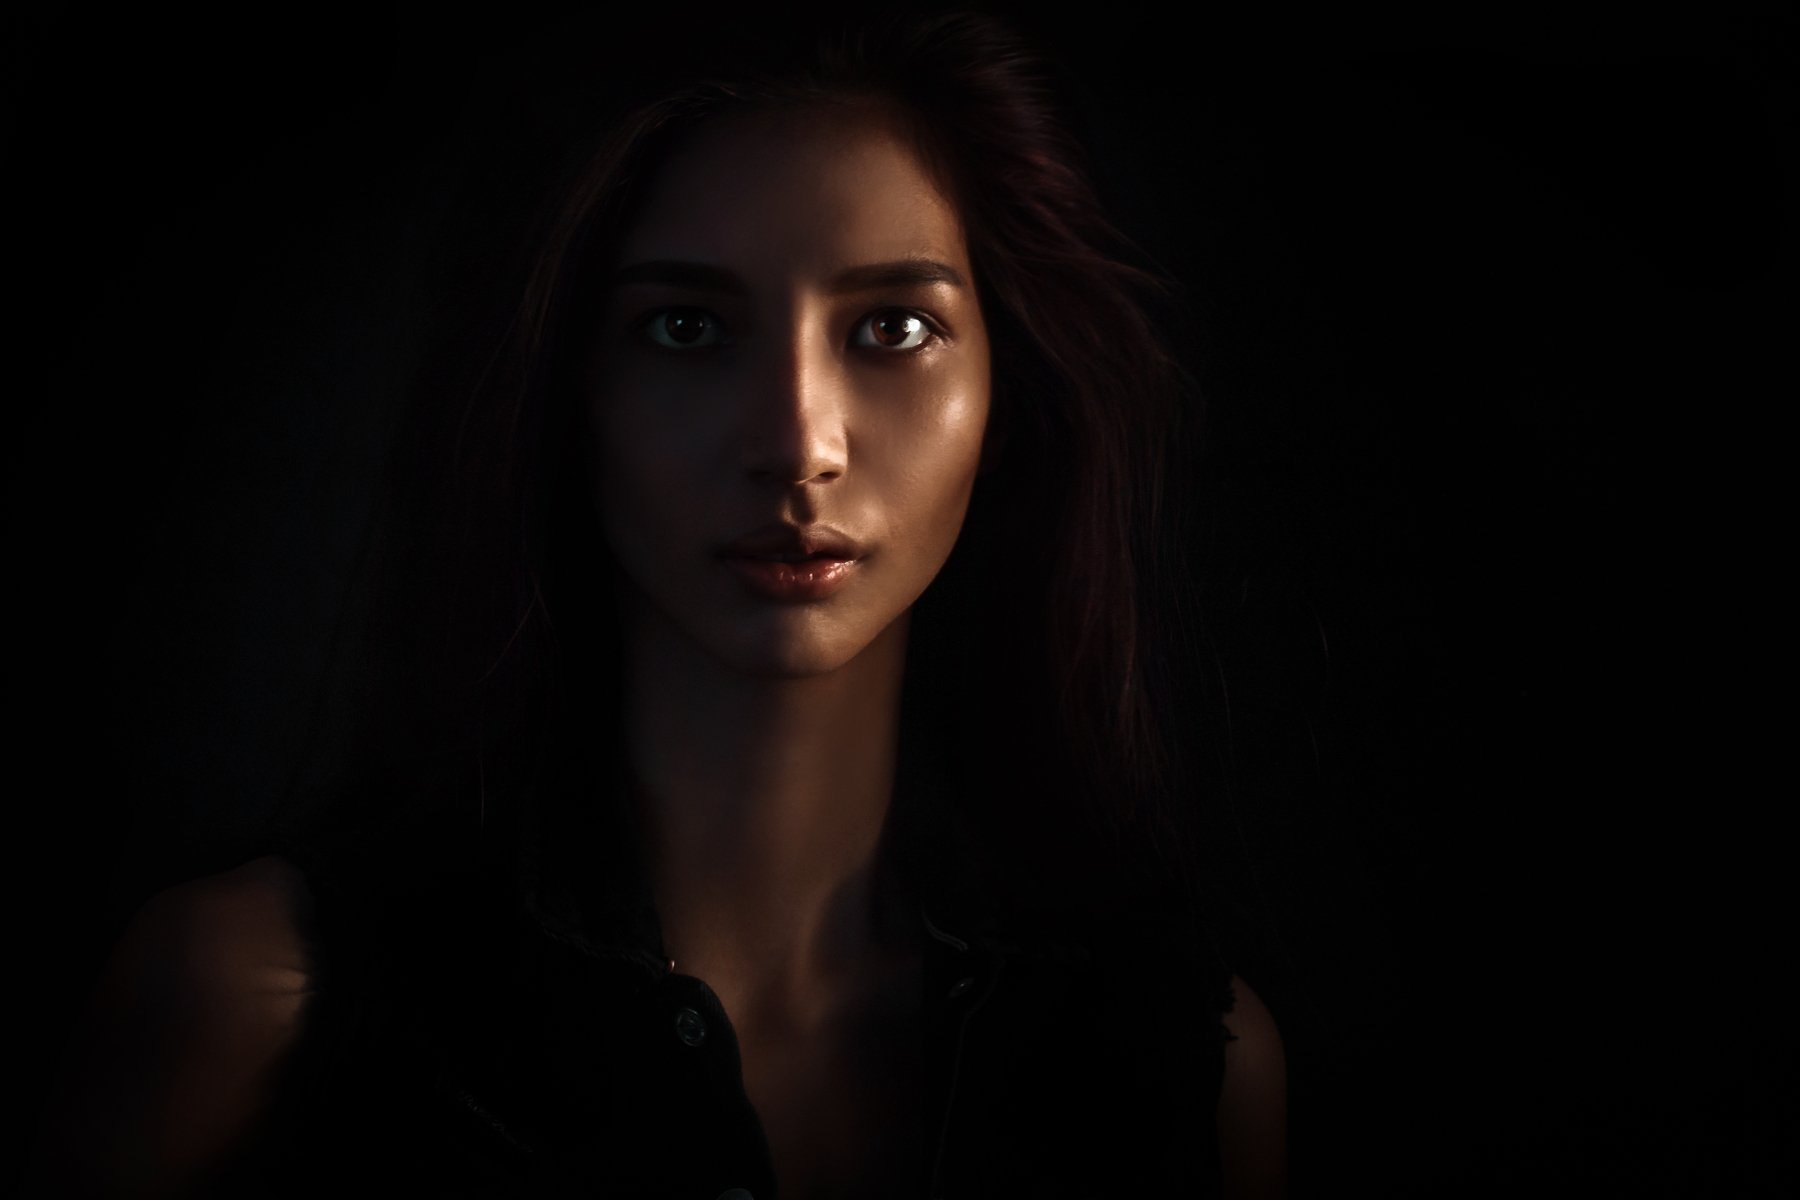 #art #girl #dark #magic, Diana Nazmutdinova